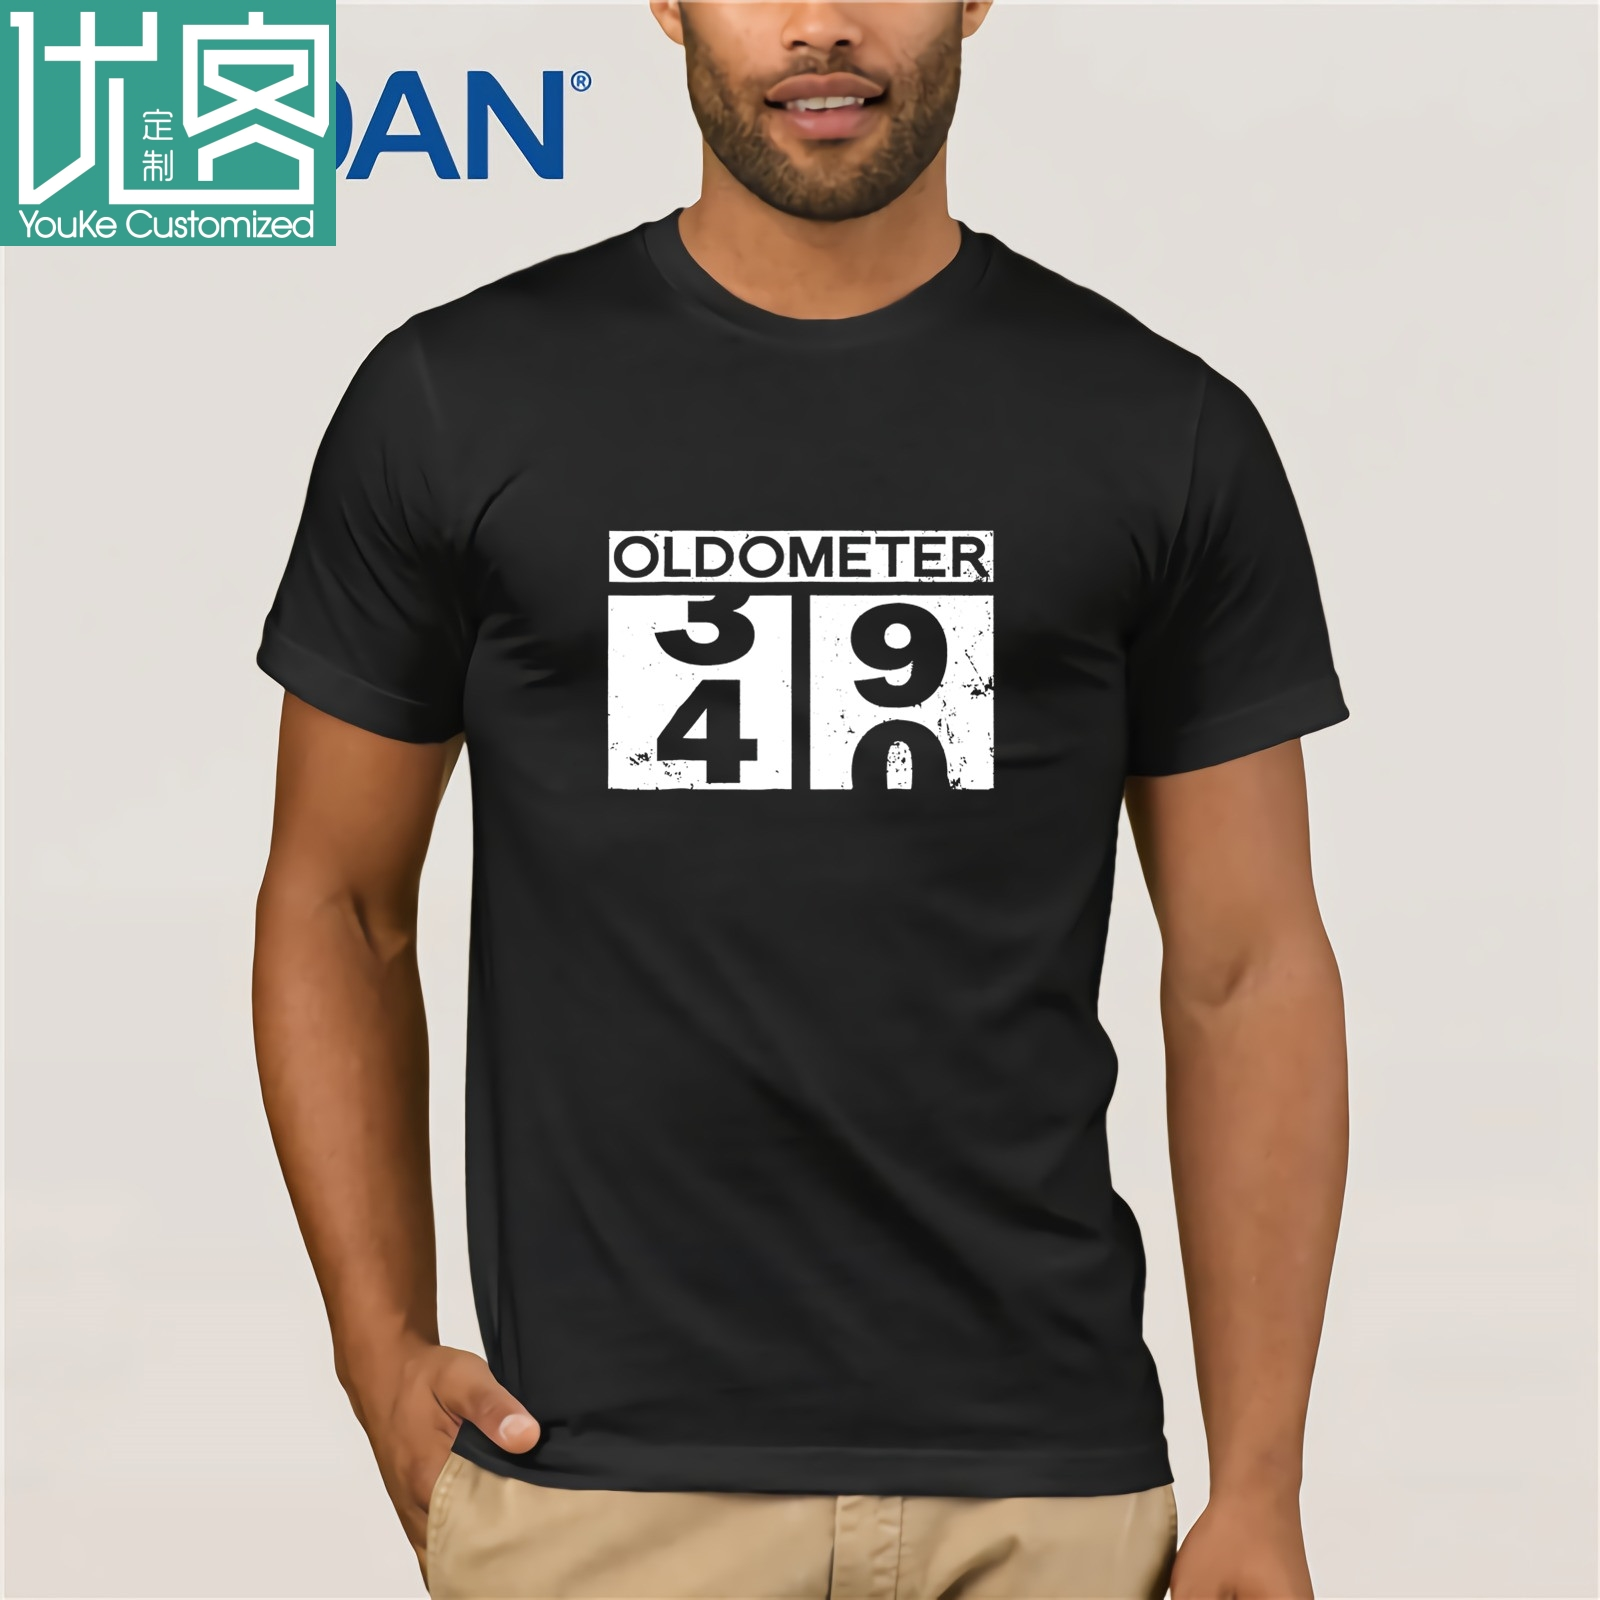 Oldometer 40 Shirt 40th Birthday Gift Men Women Funny Shirts 2019 Summer Herren Classic Short Sleeve T-Shirt Tee